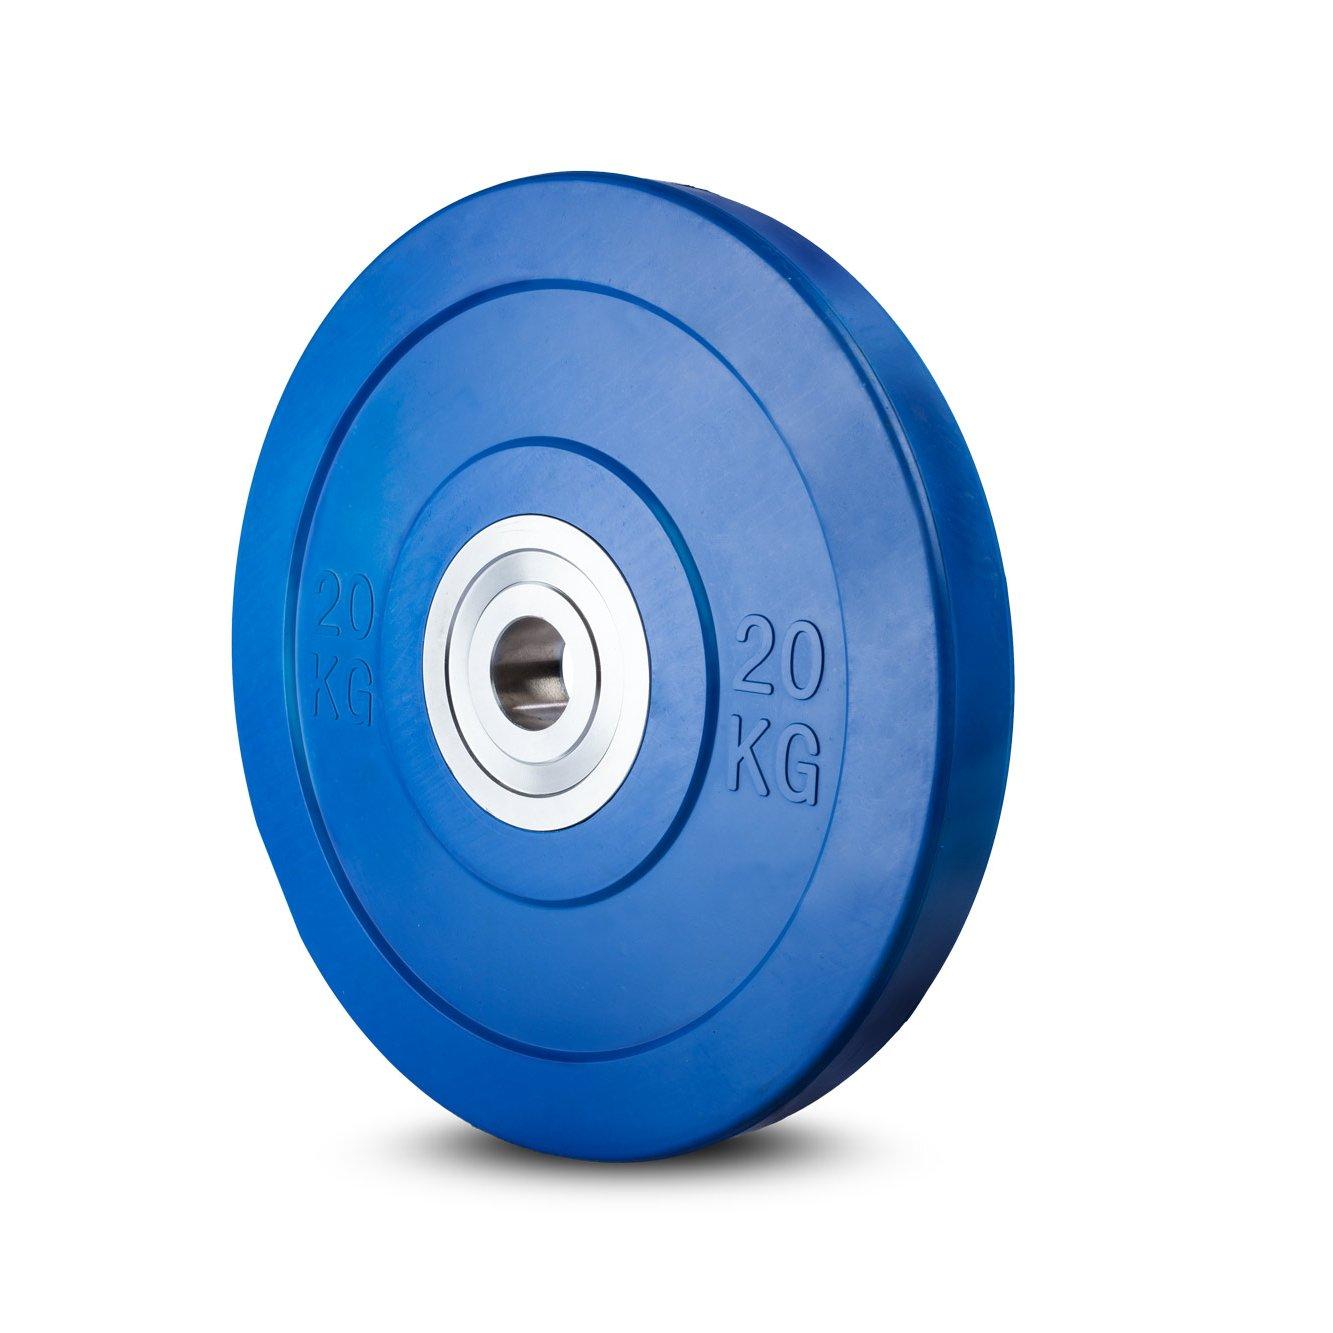 Lex Quinta Competition Bumper Plate 20kg - blau